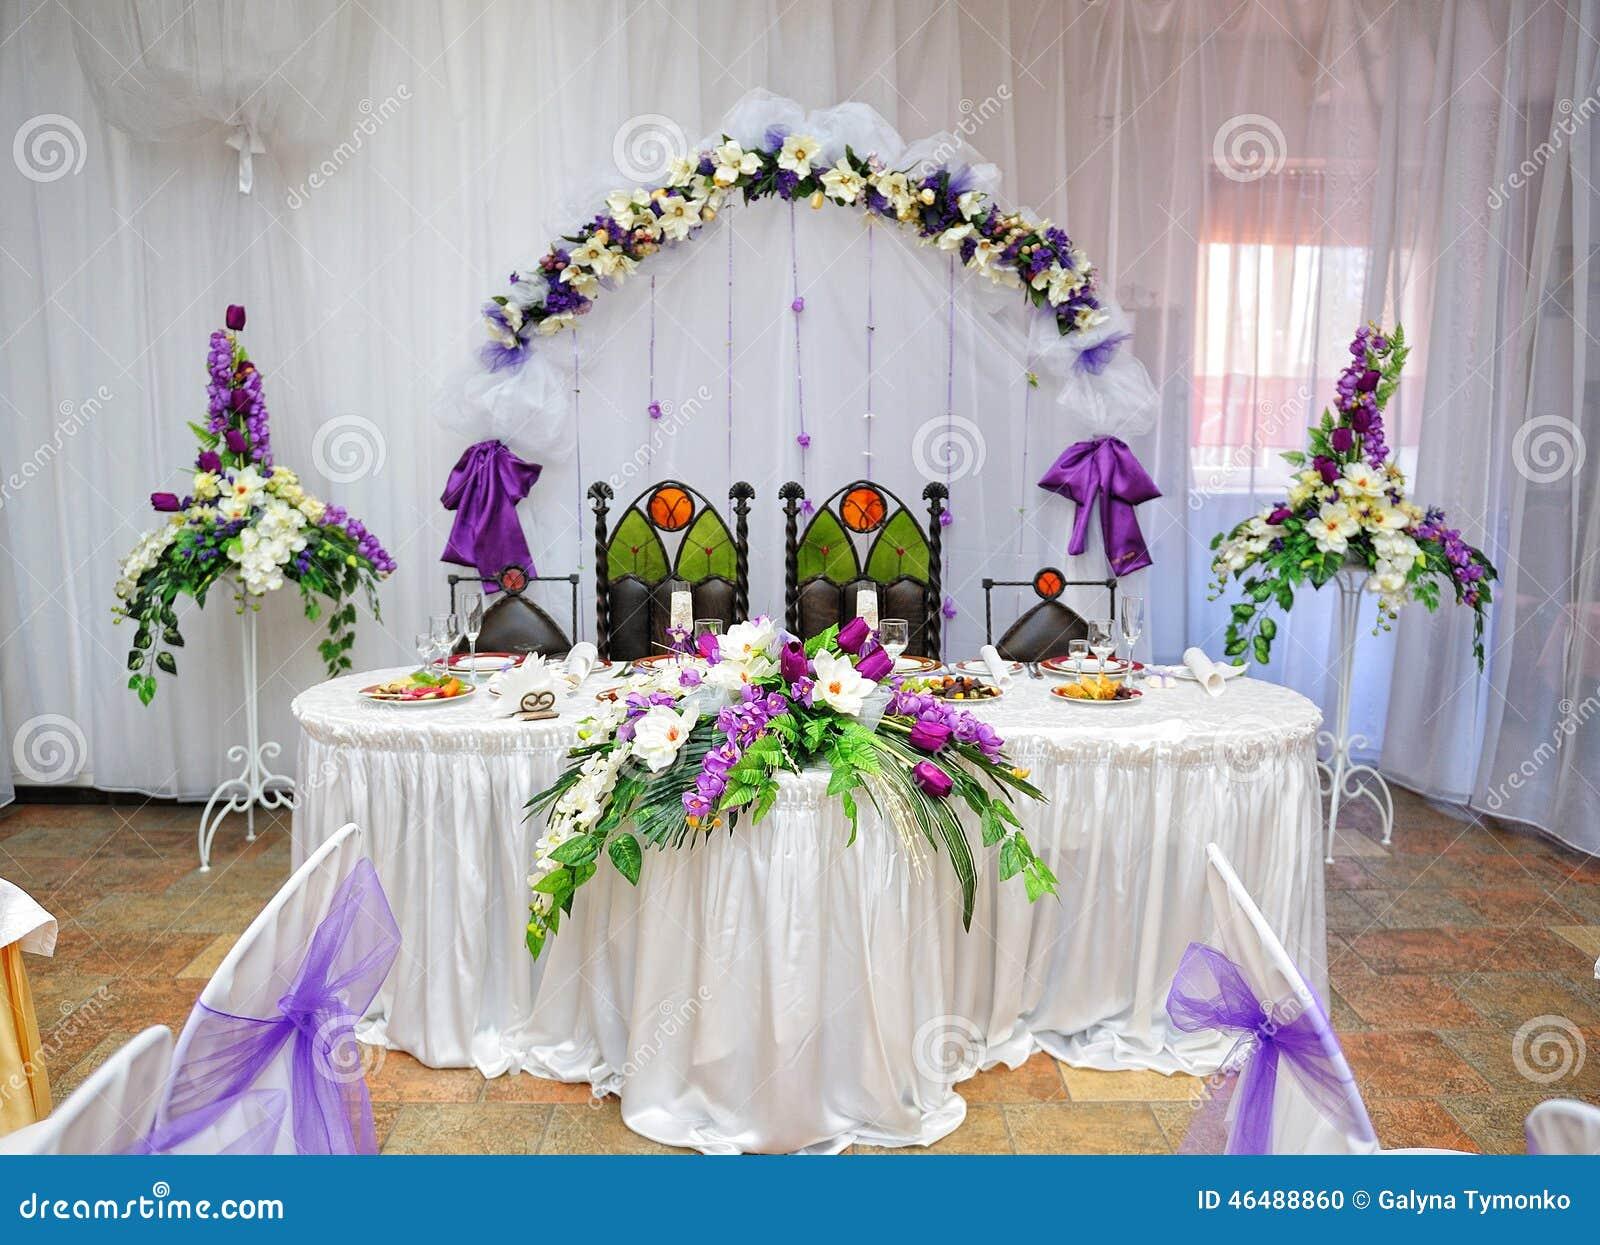 jeunes mari s de d coration de table de mariage photo stock image 46488860. Black Bedroom Furniture Sets. Home Design Ideas